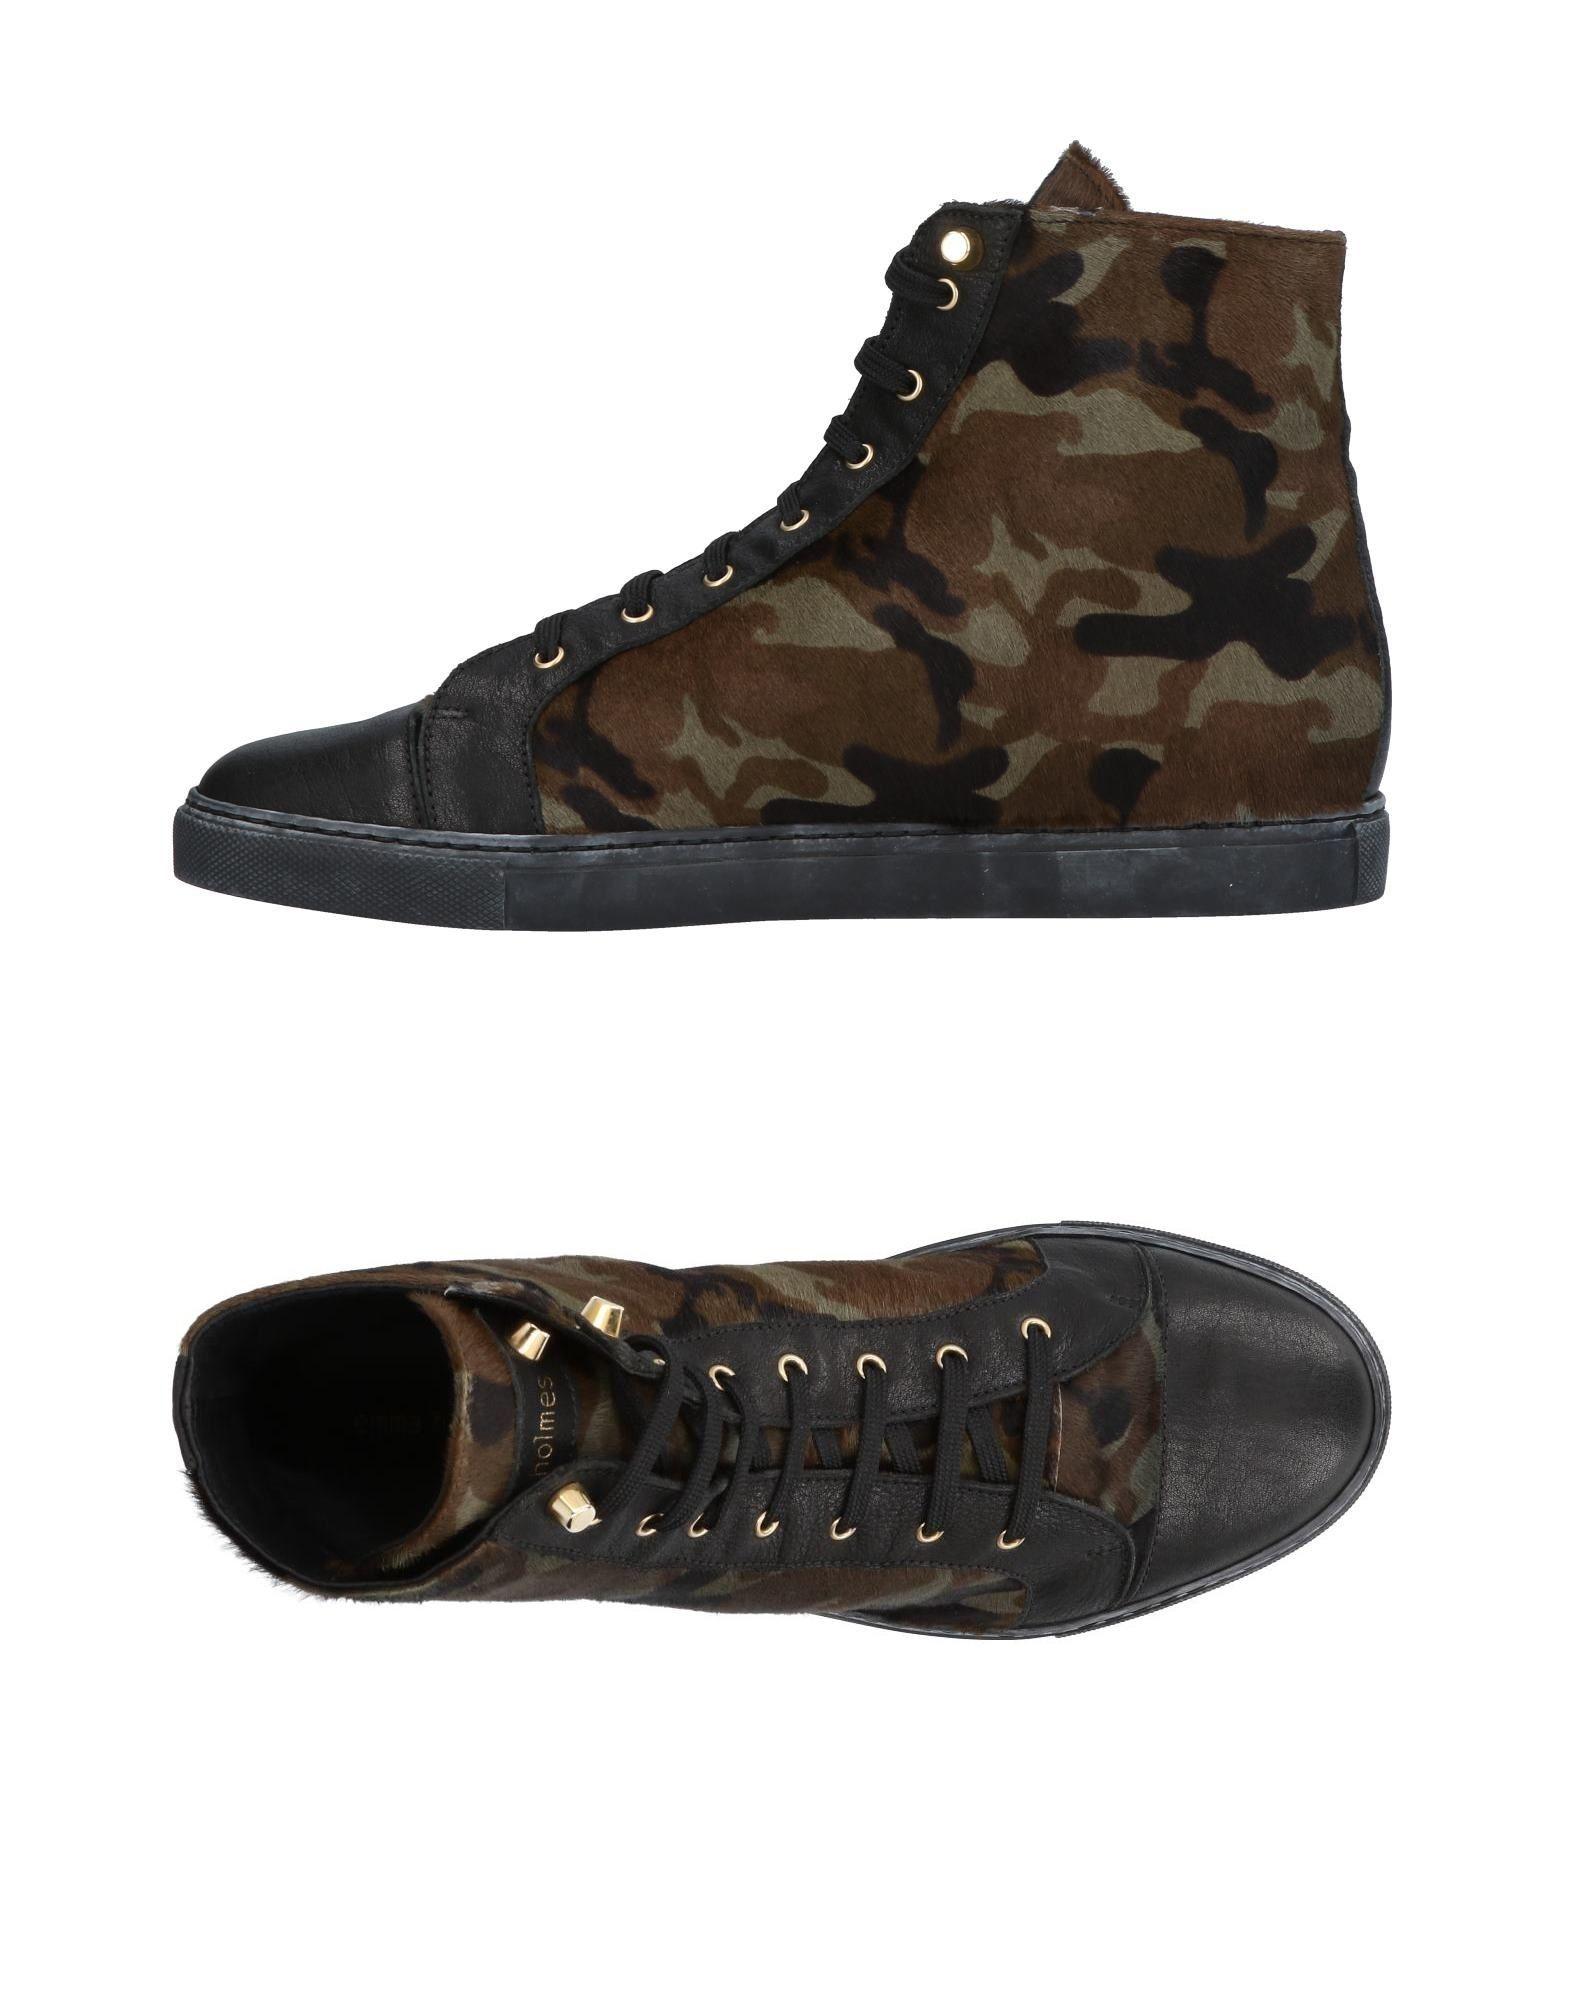 Sneakers Emma Holmes Femme - Sneakers Emma Holmes sur